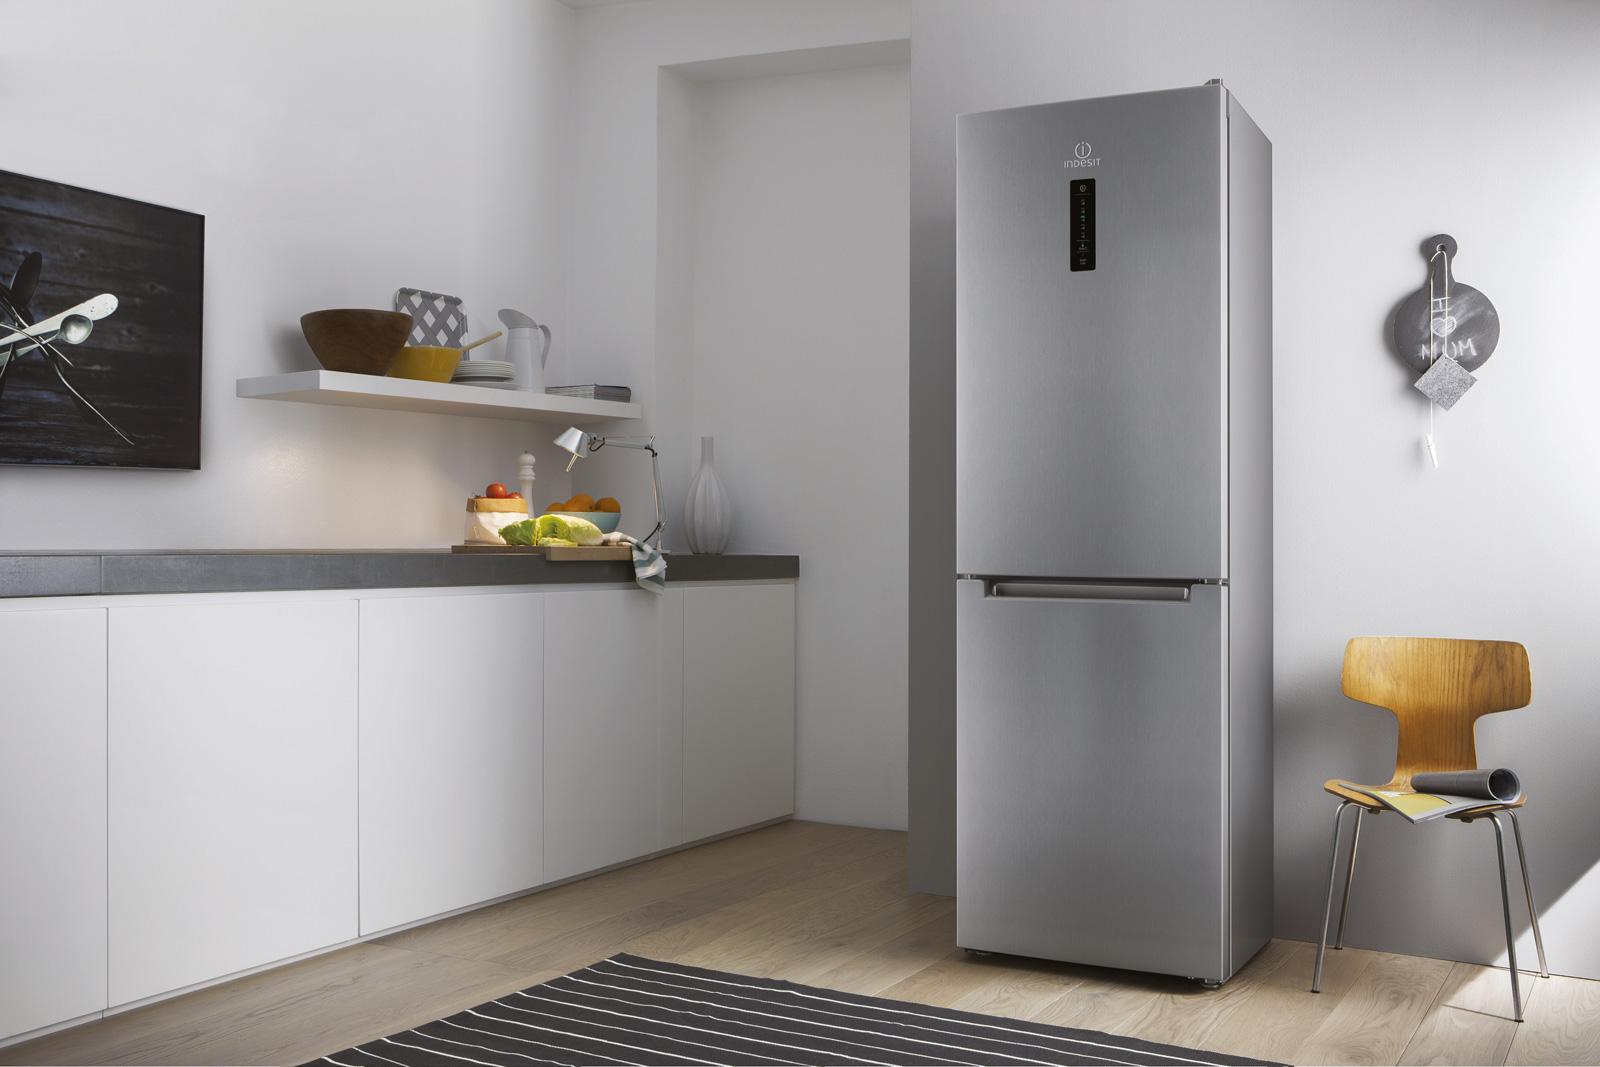 cucine con frigo esterno ih73 pineglen. Black Bedroom Furniture Sets. Home Design Ideas